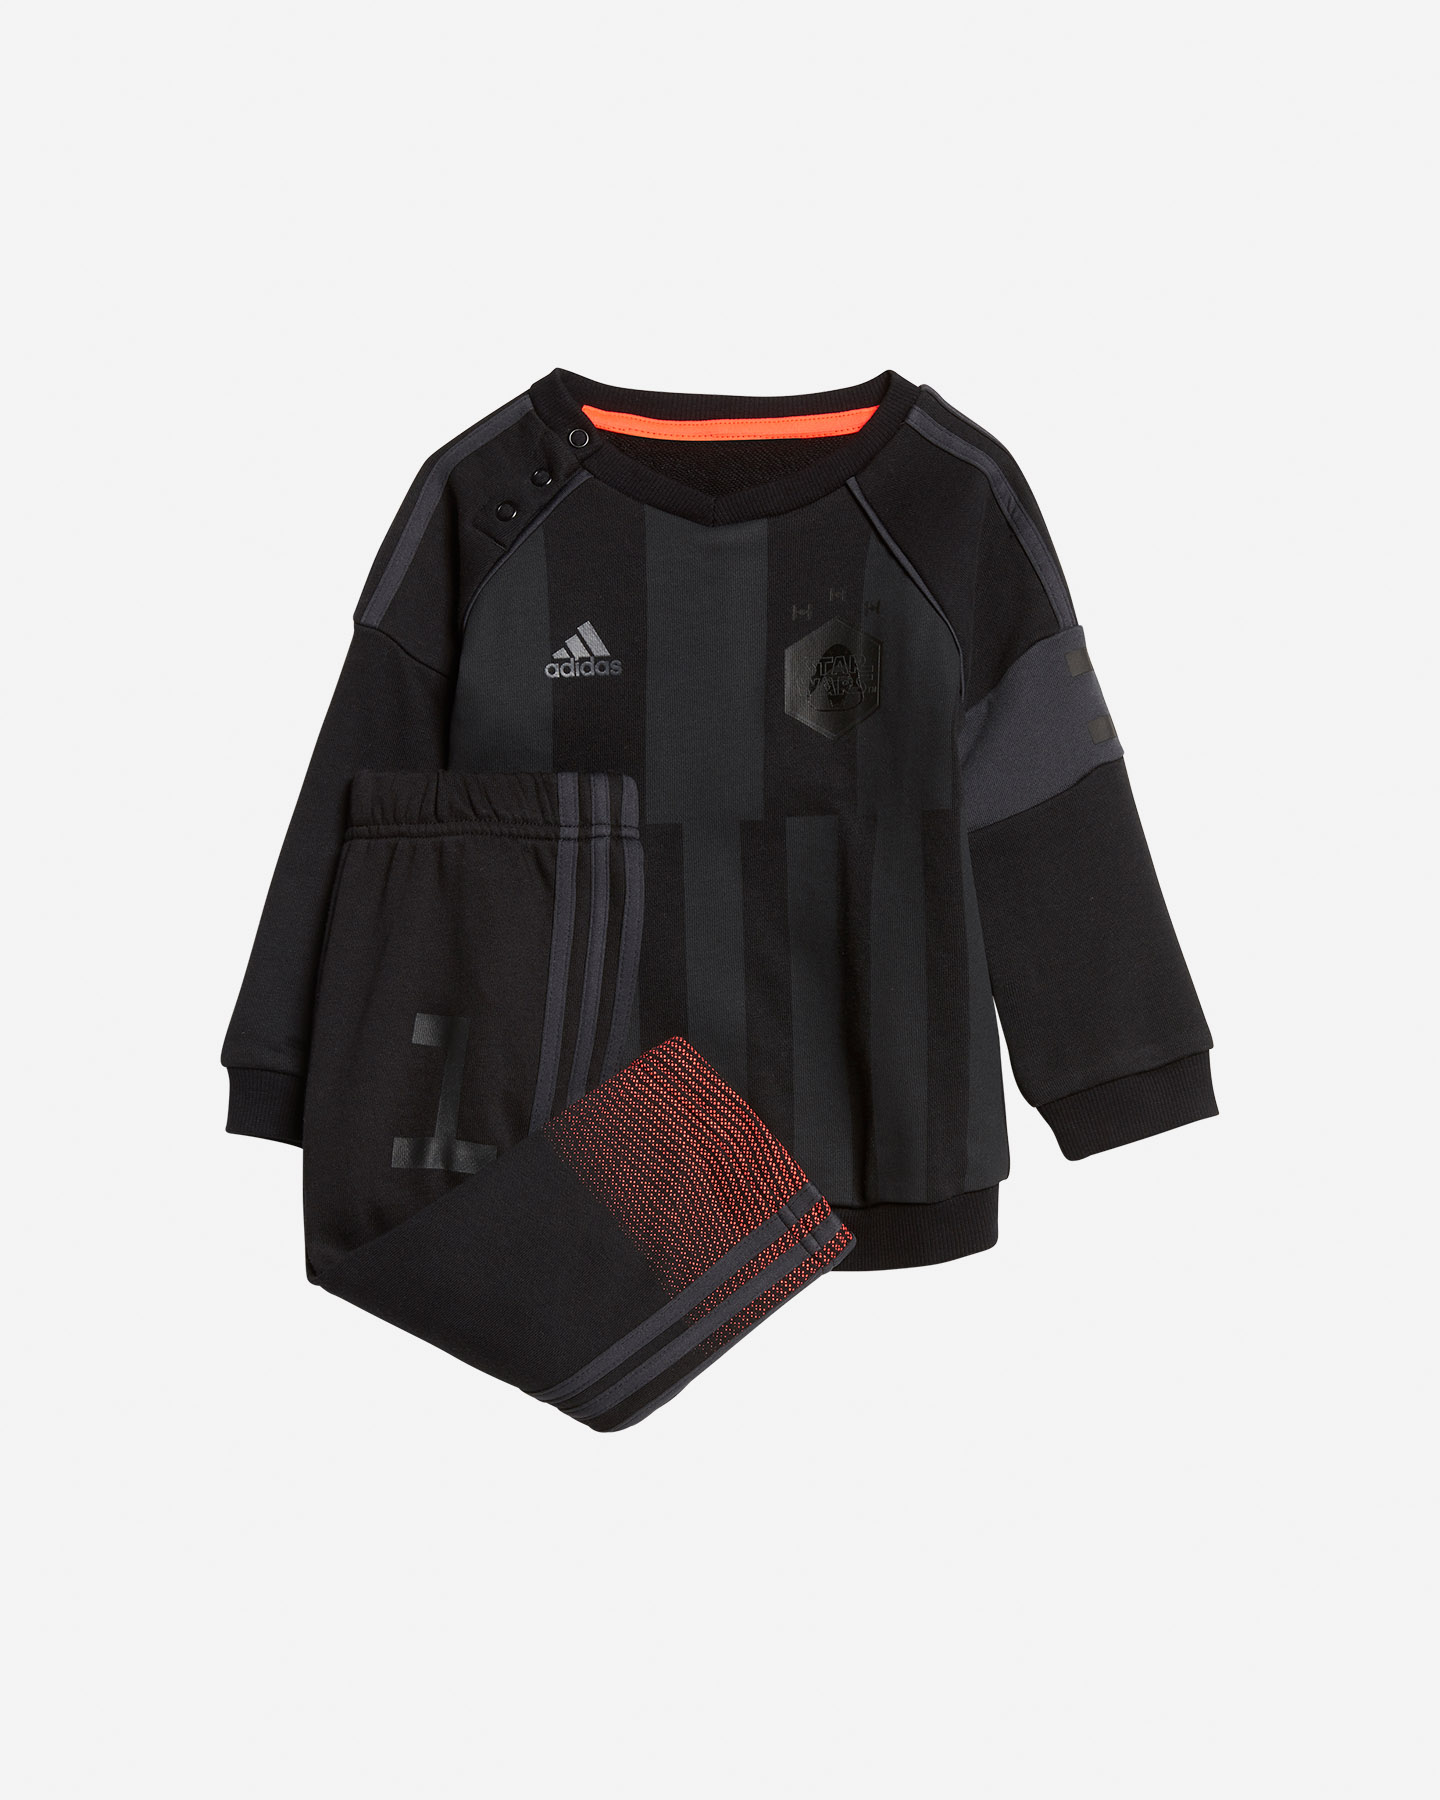 8fac72721d Acquista tuta adidas - OFF69% sconti